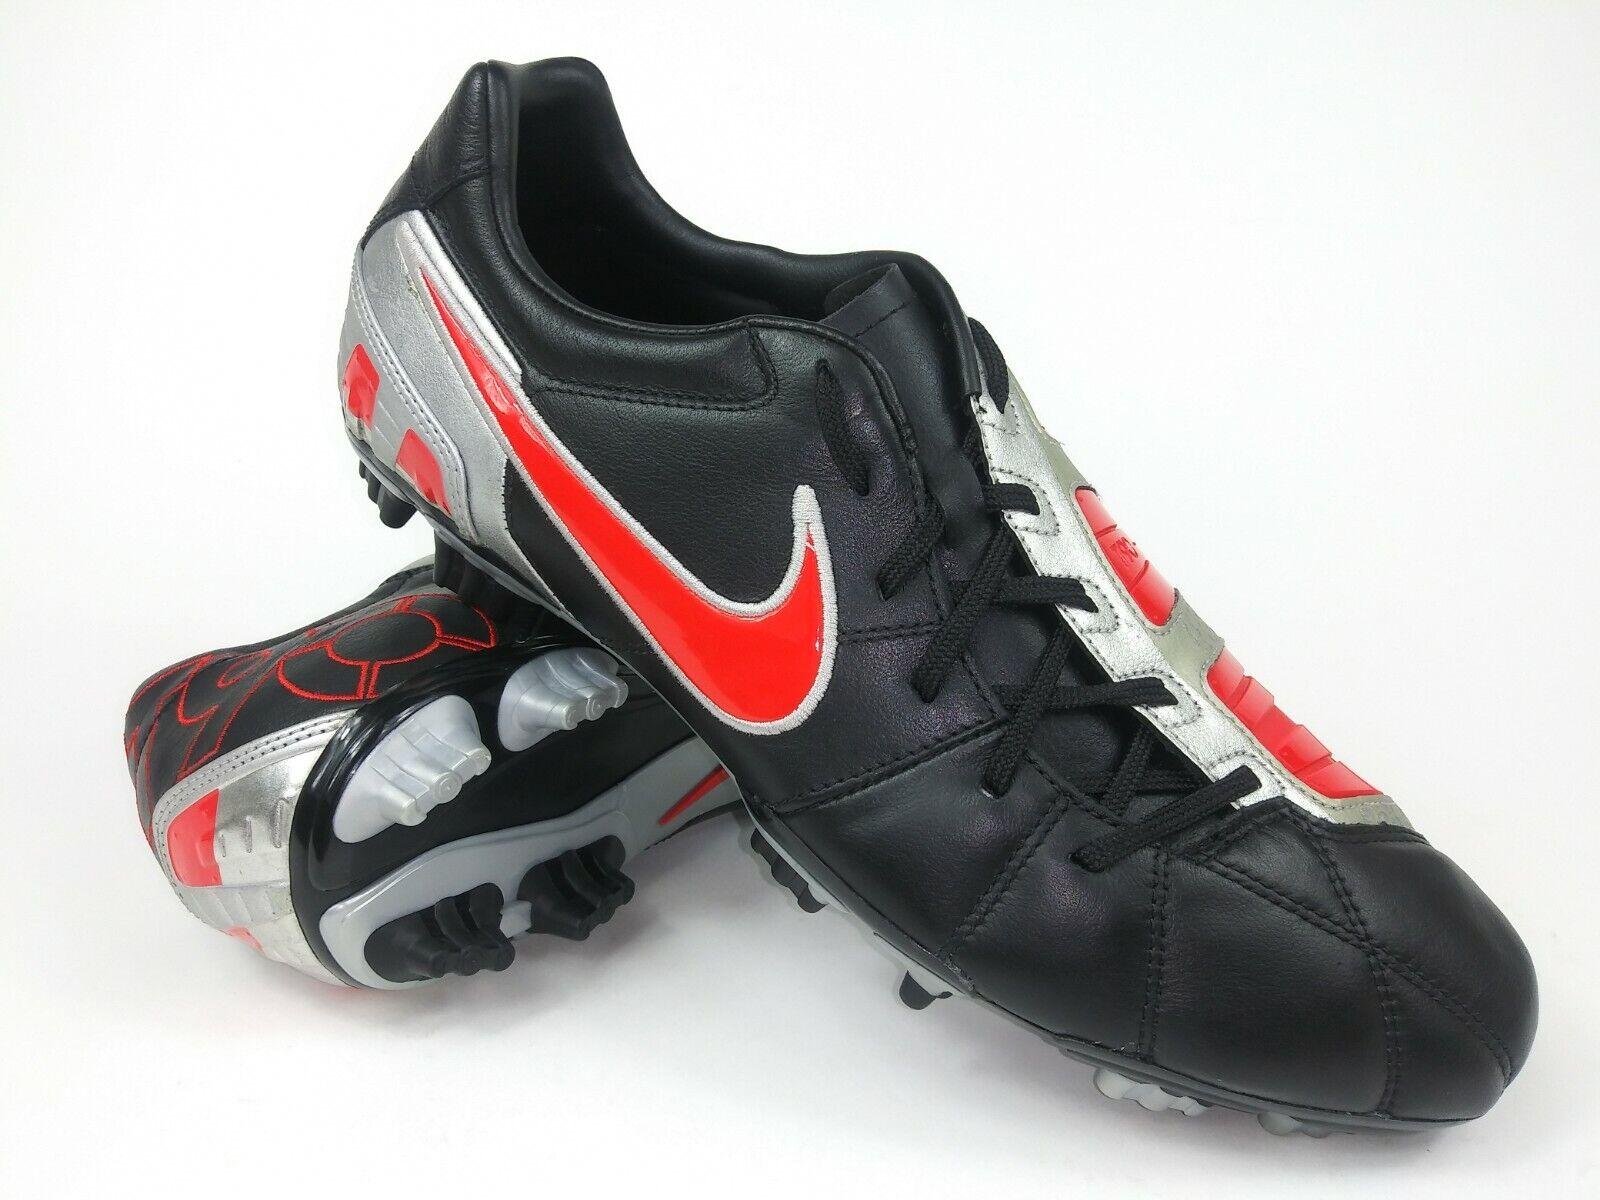 Nike Hombre Raro total 90 disparar Lll L-fg 385401-061 Negro Rojo Botines De Fútbol Talla 12